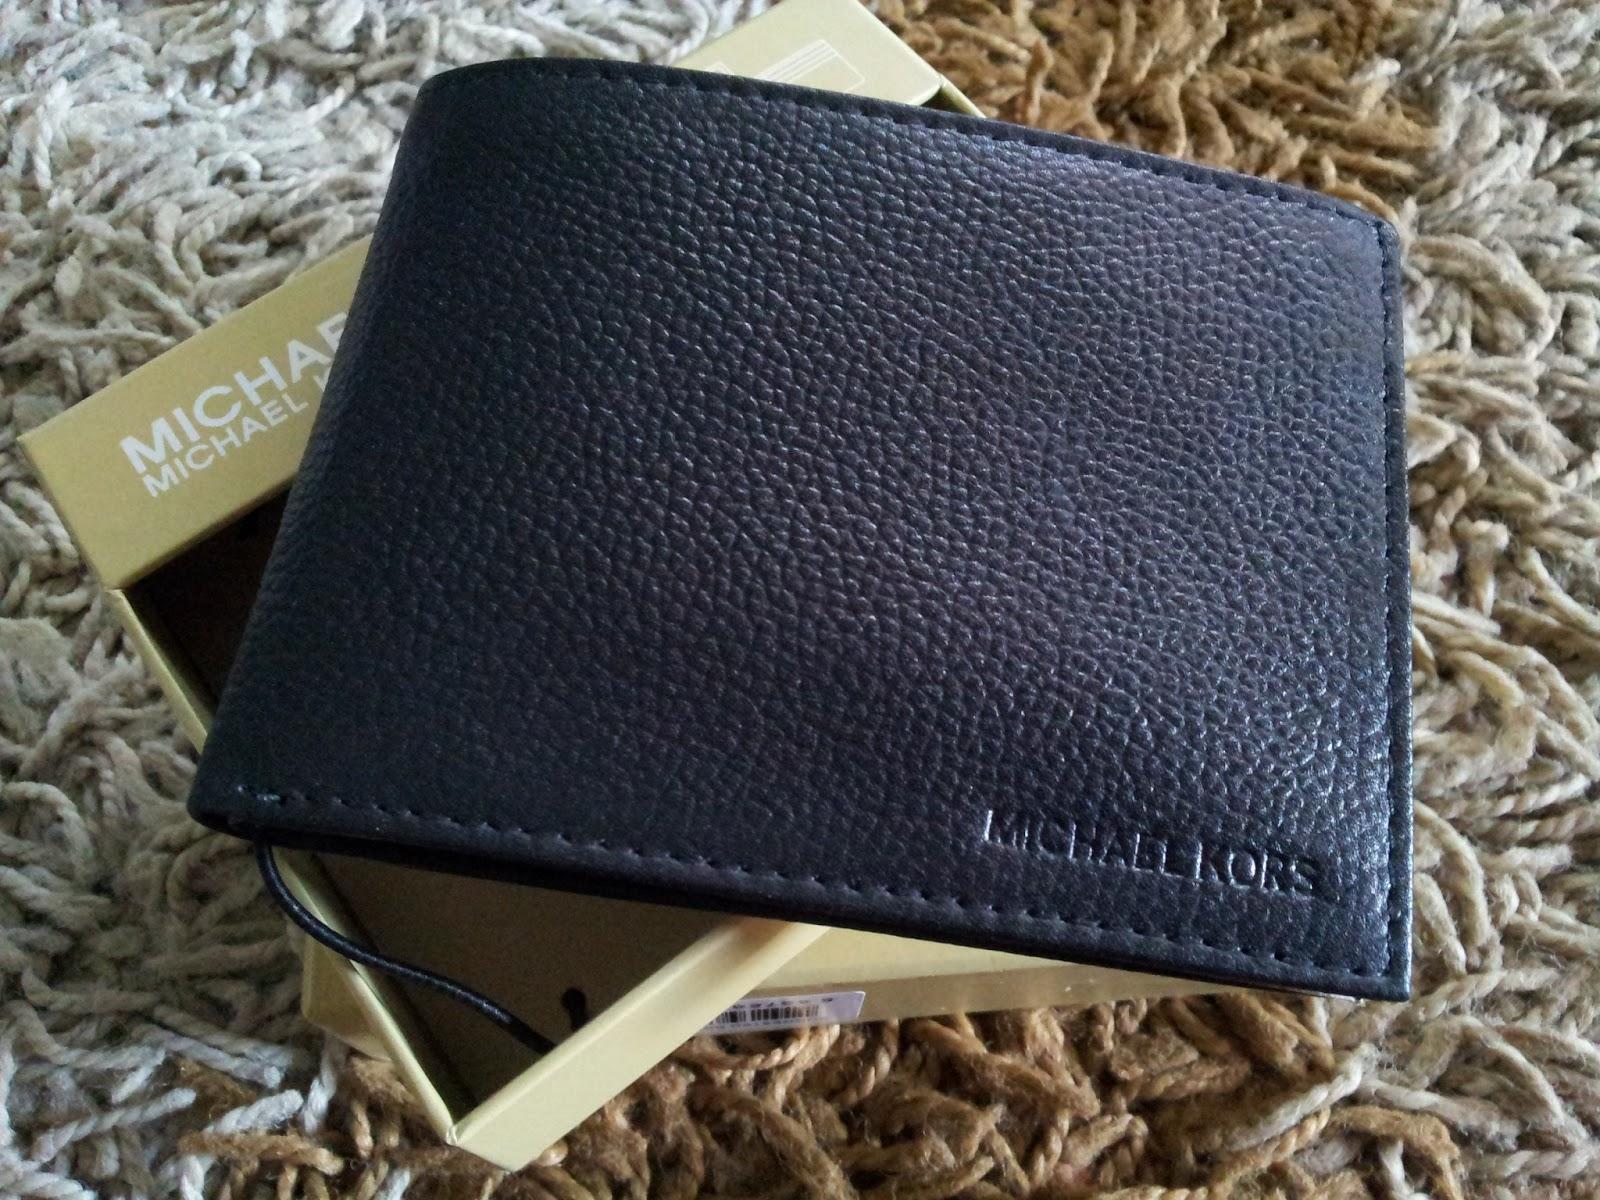 87792ec3d65d PrettyTreasure2u: Michael Kors Mens Leather Passcase Wallet Black